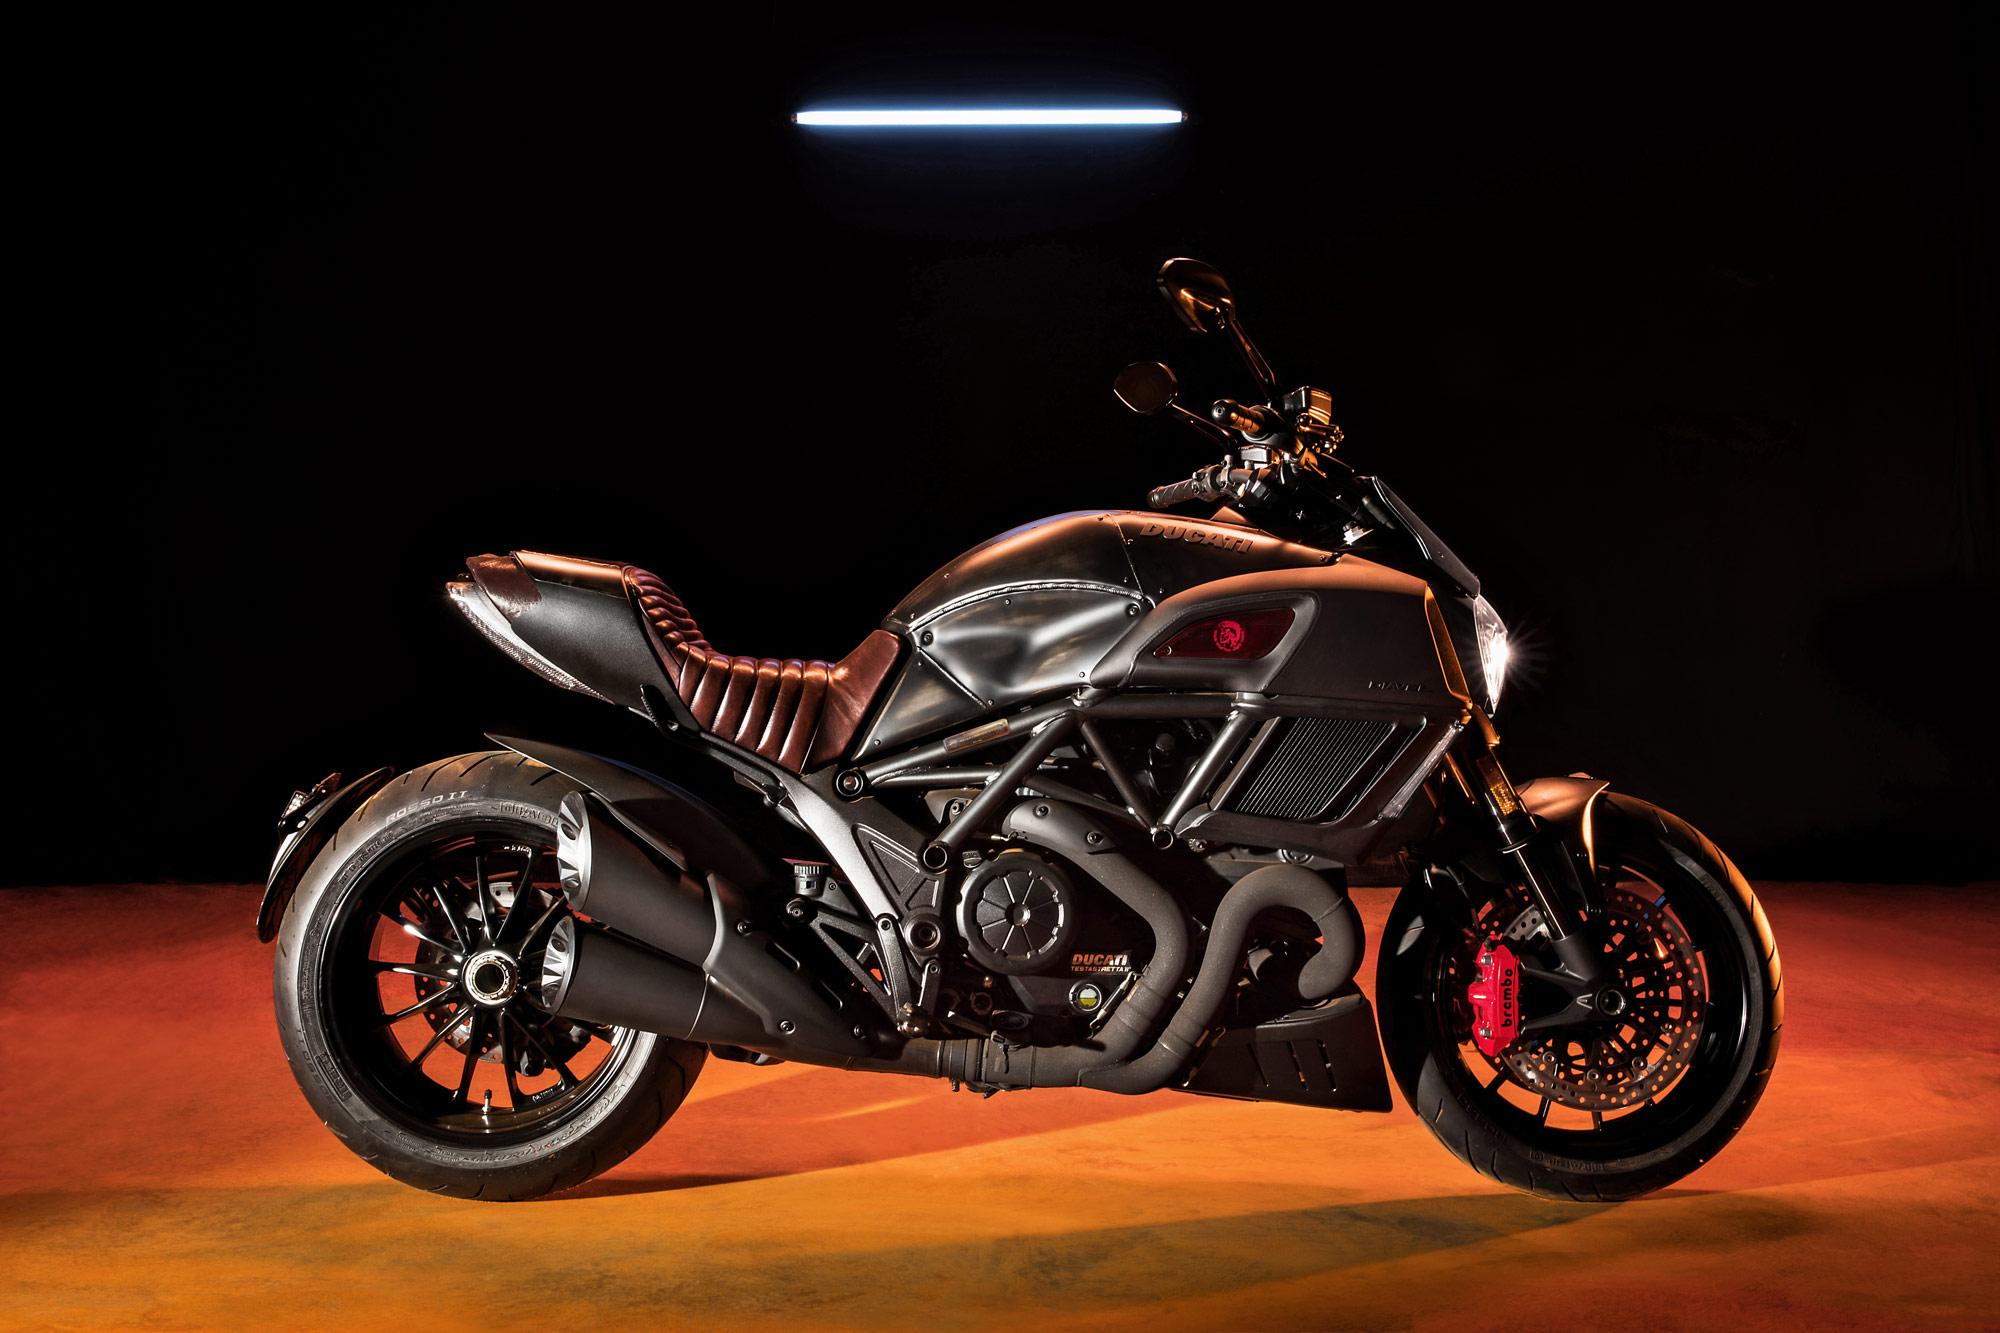 The Ducati Diavel Diesel - 'Bellezza' On Two Wheels